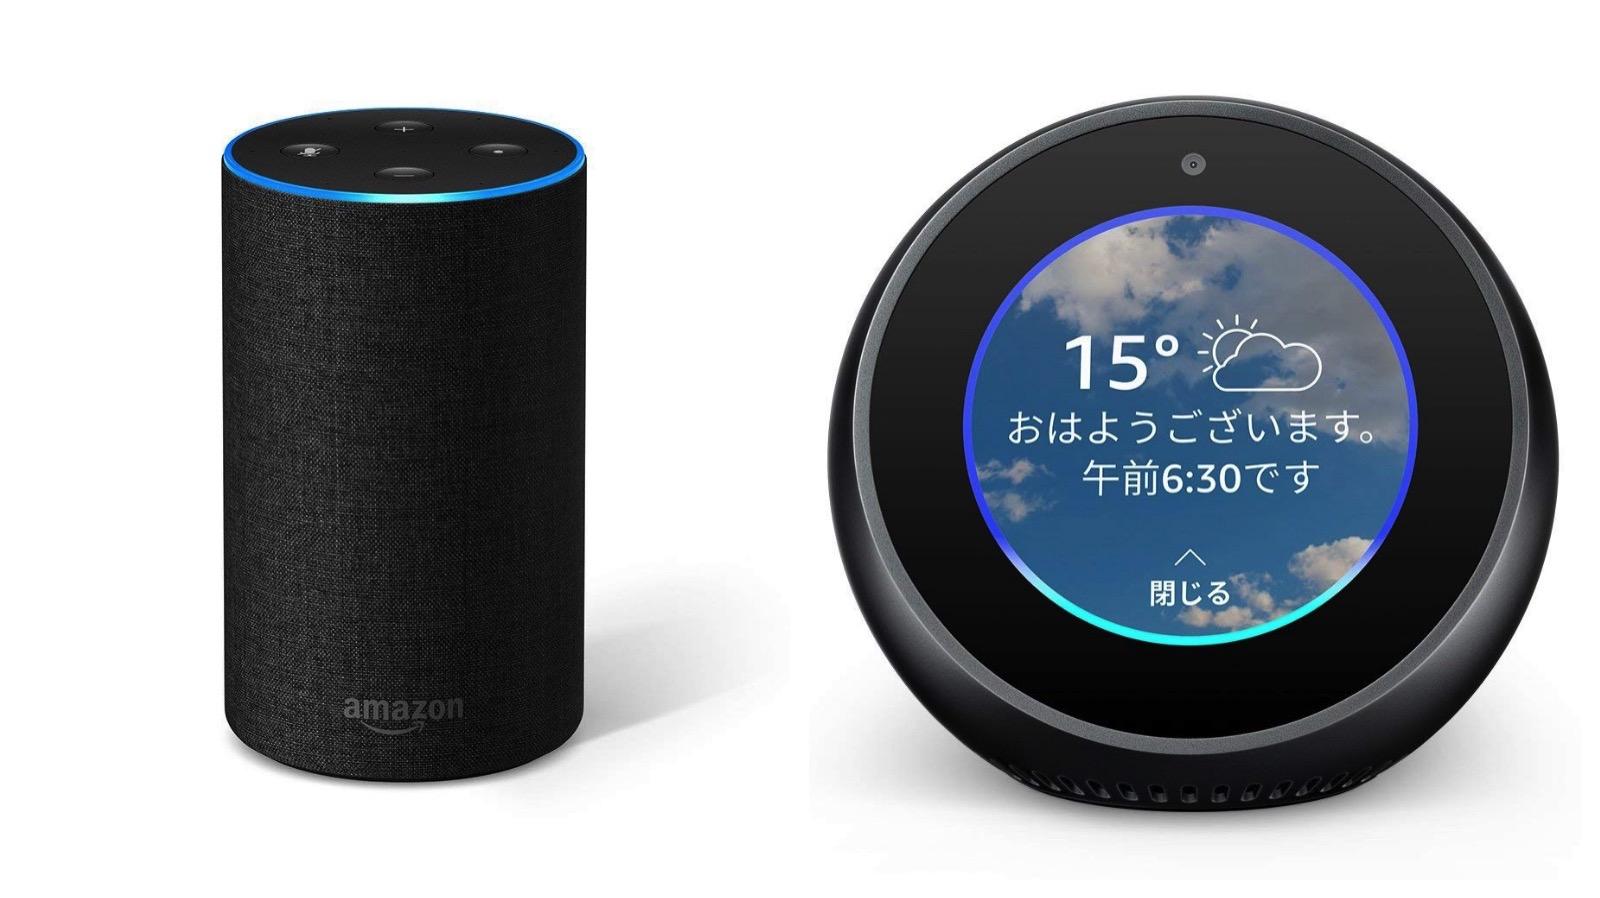 Amazon Echo and EchoSpot Sale